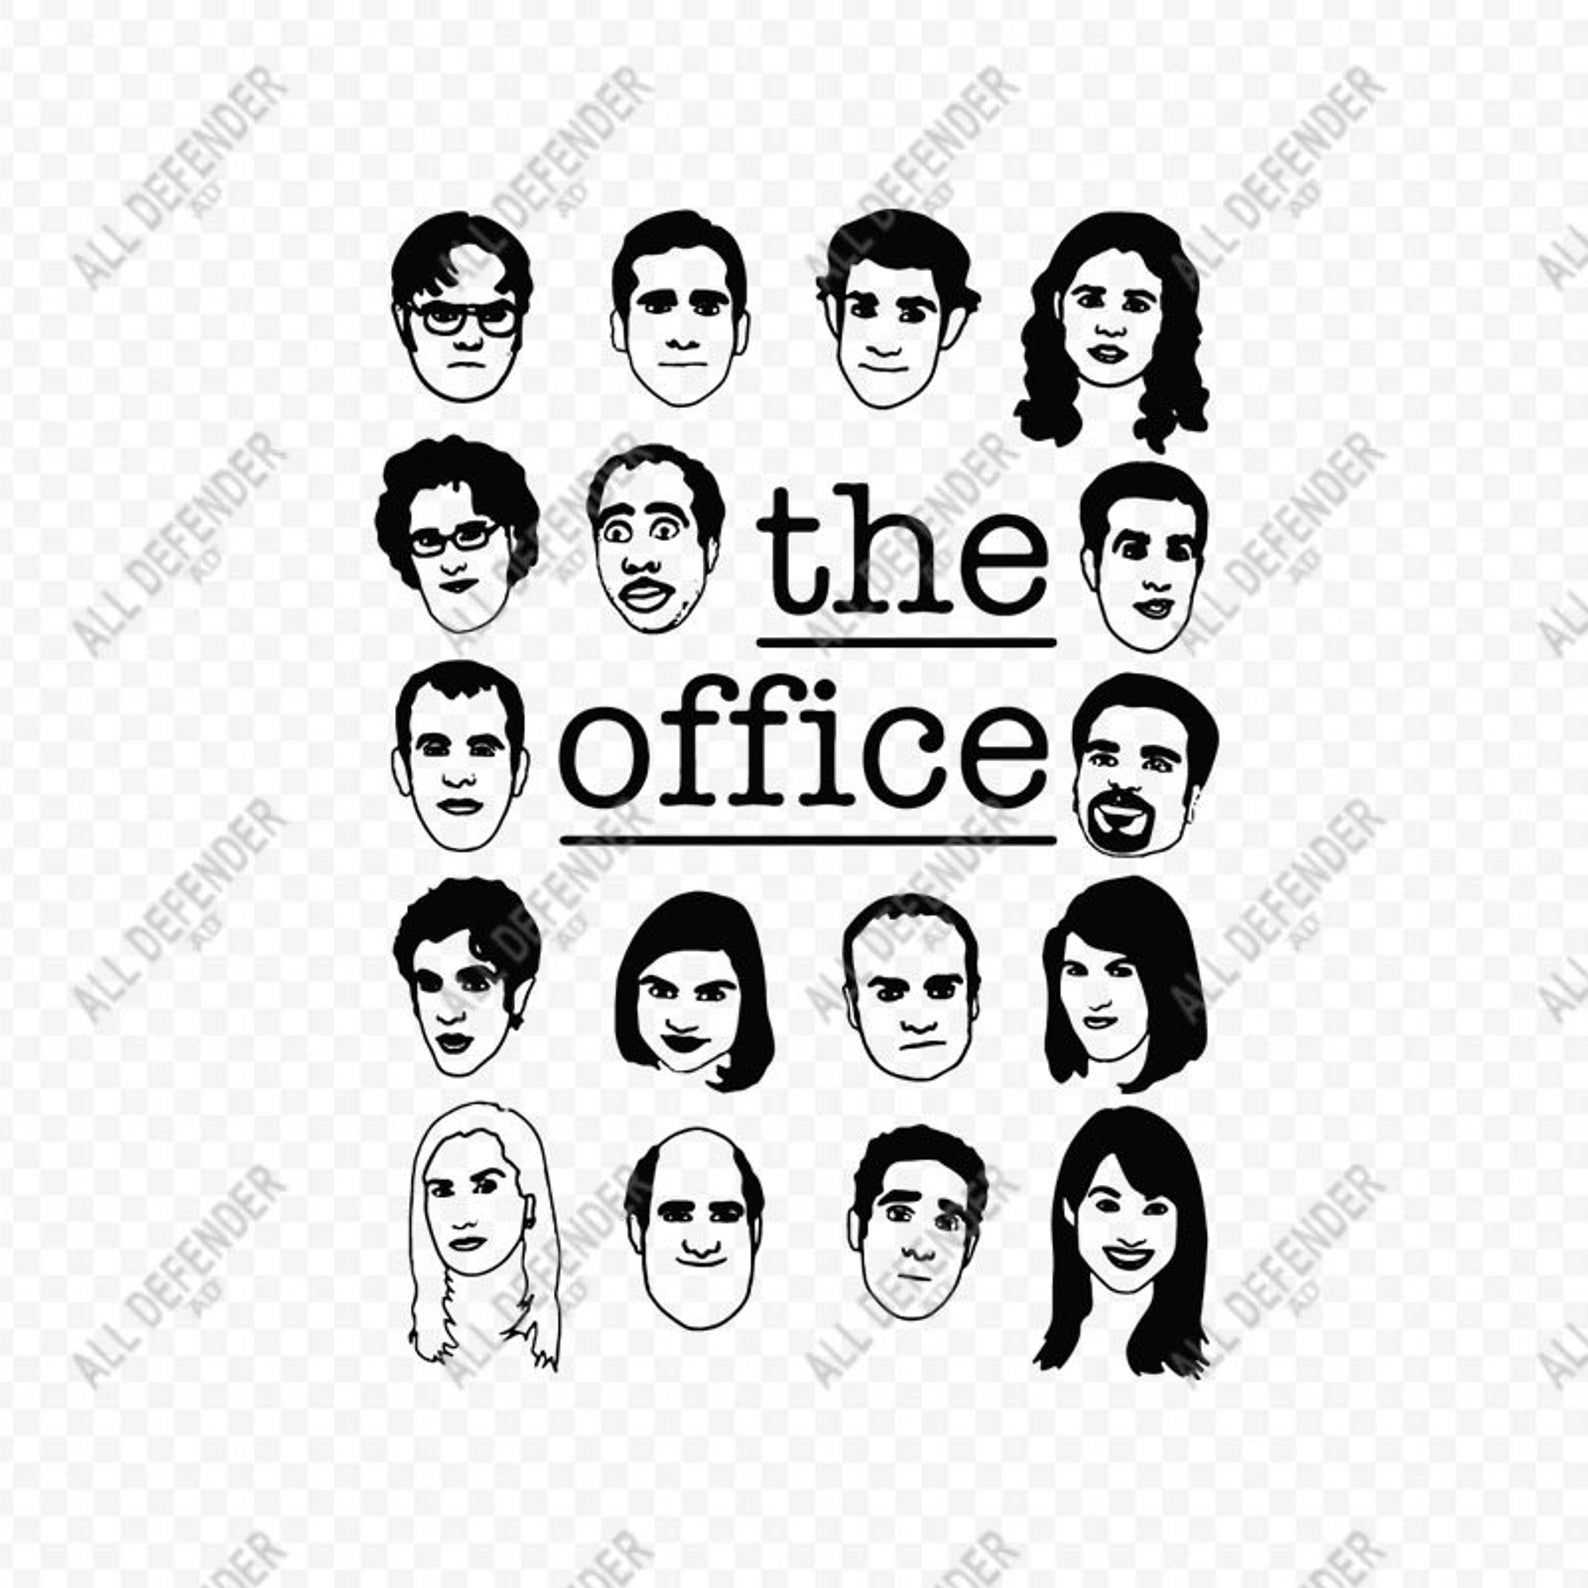 The Office Cast Svg Schrute Farms Svg Dwight Schrute Svg